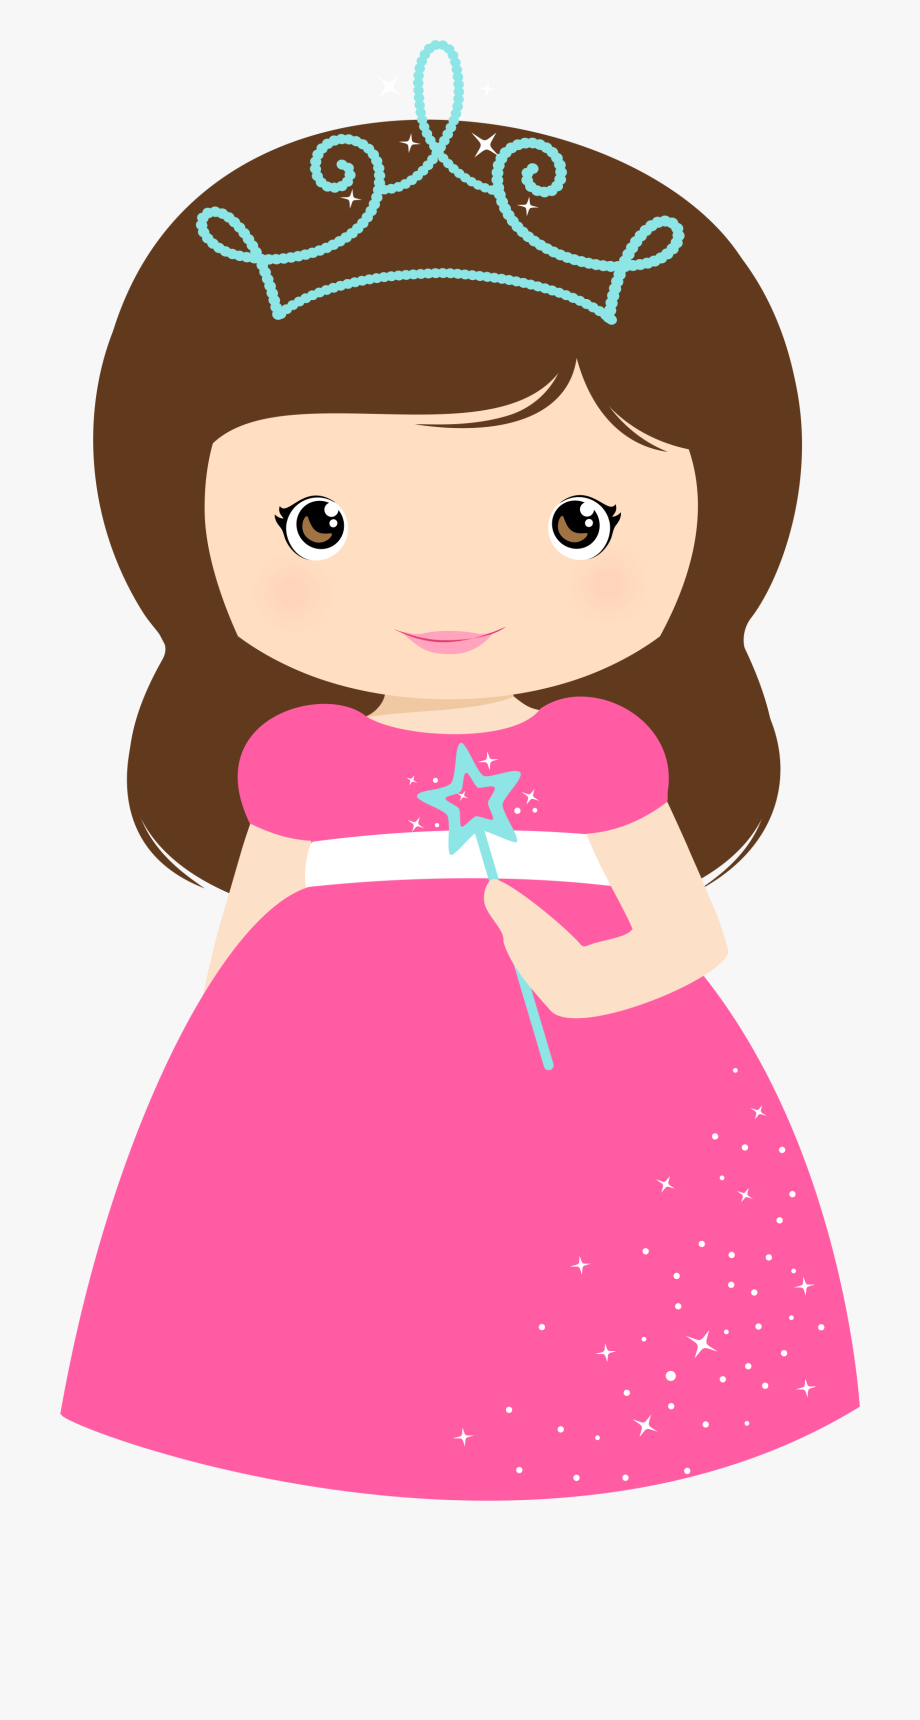 Free princess clipart images clip art transparent library Princess Party, Princess Palace, Disney Princess, Princess ... clip art transparent library